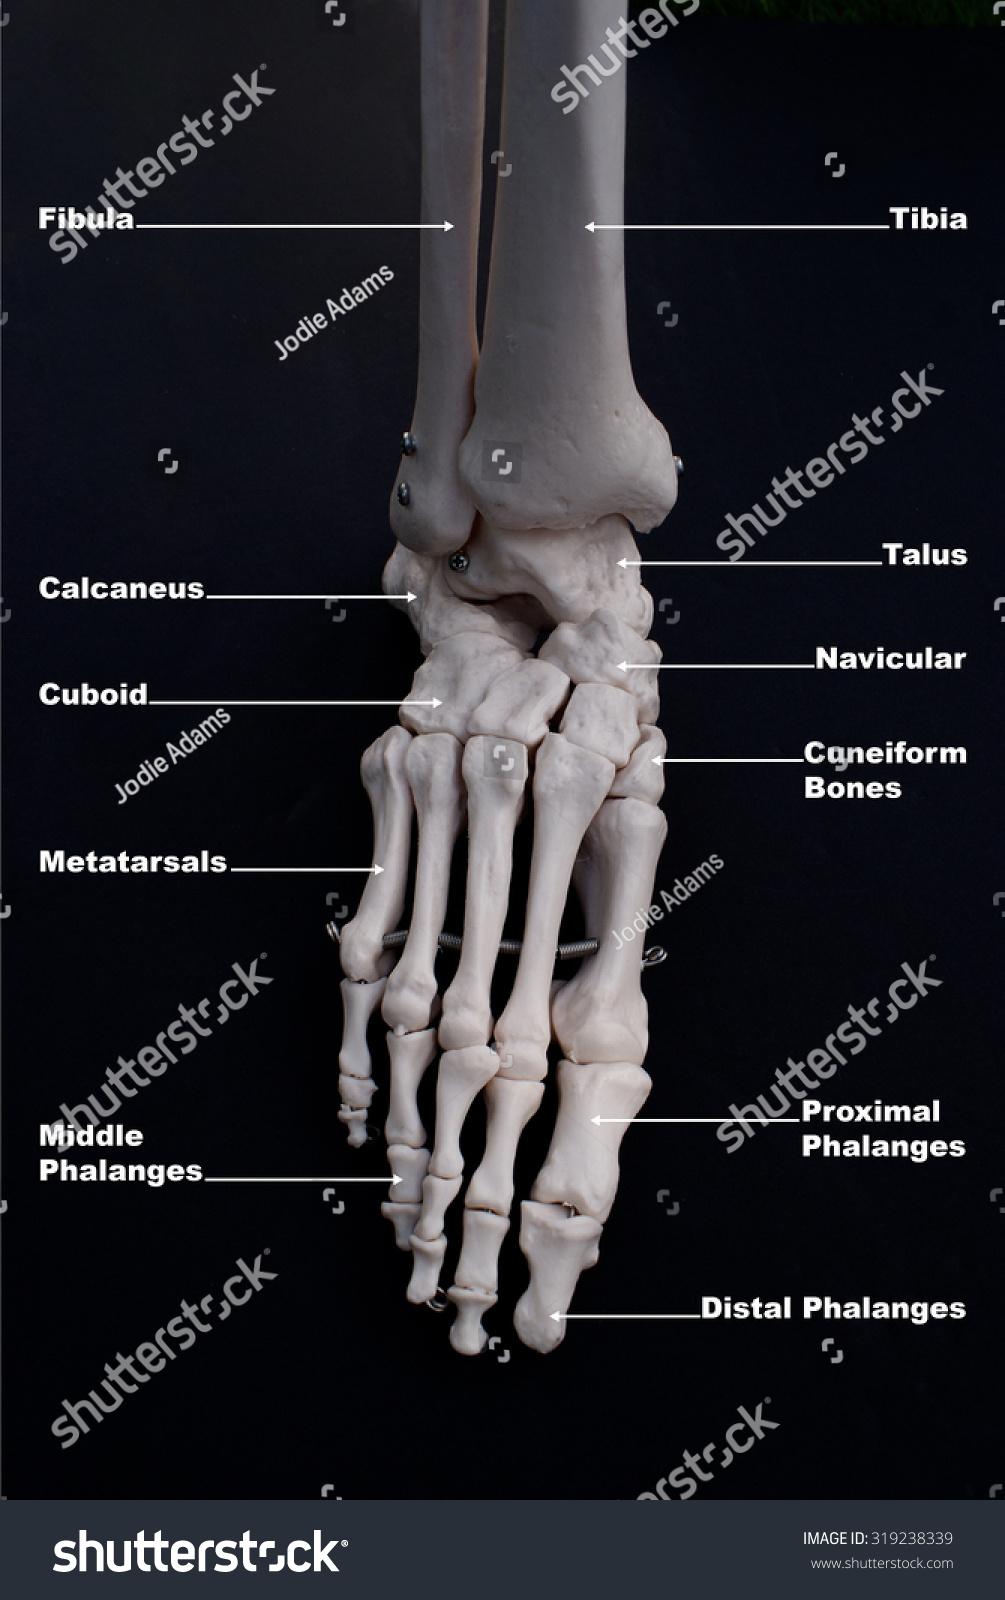 Anterior View Bones Foot Labelled People Stock Image 319238339